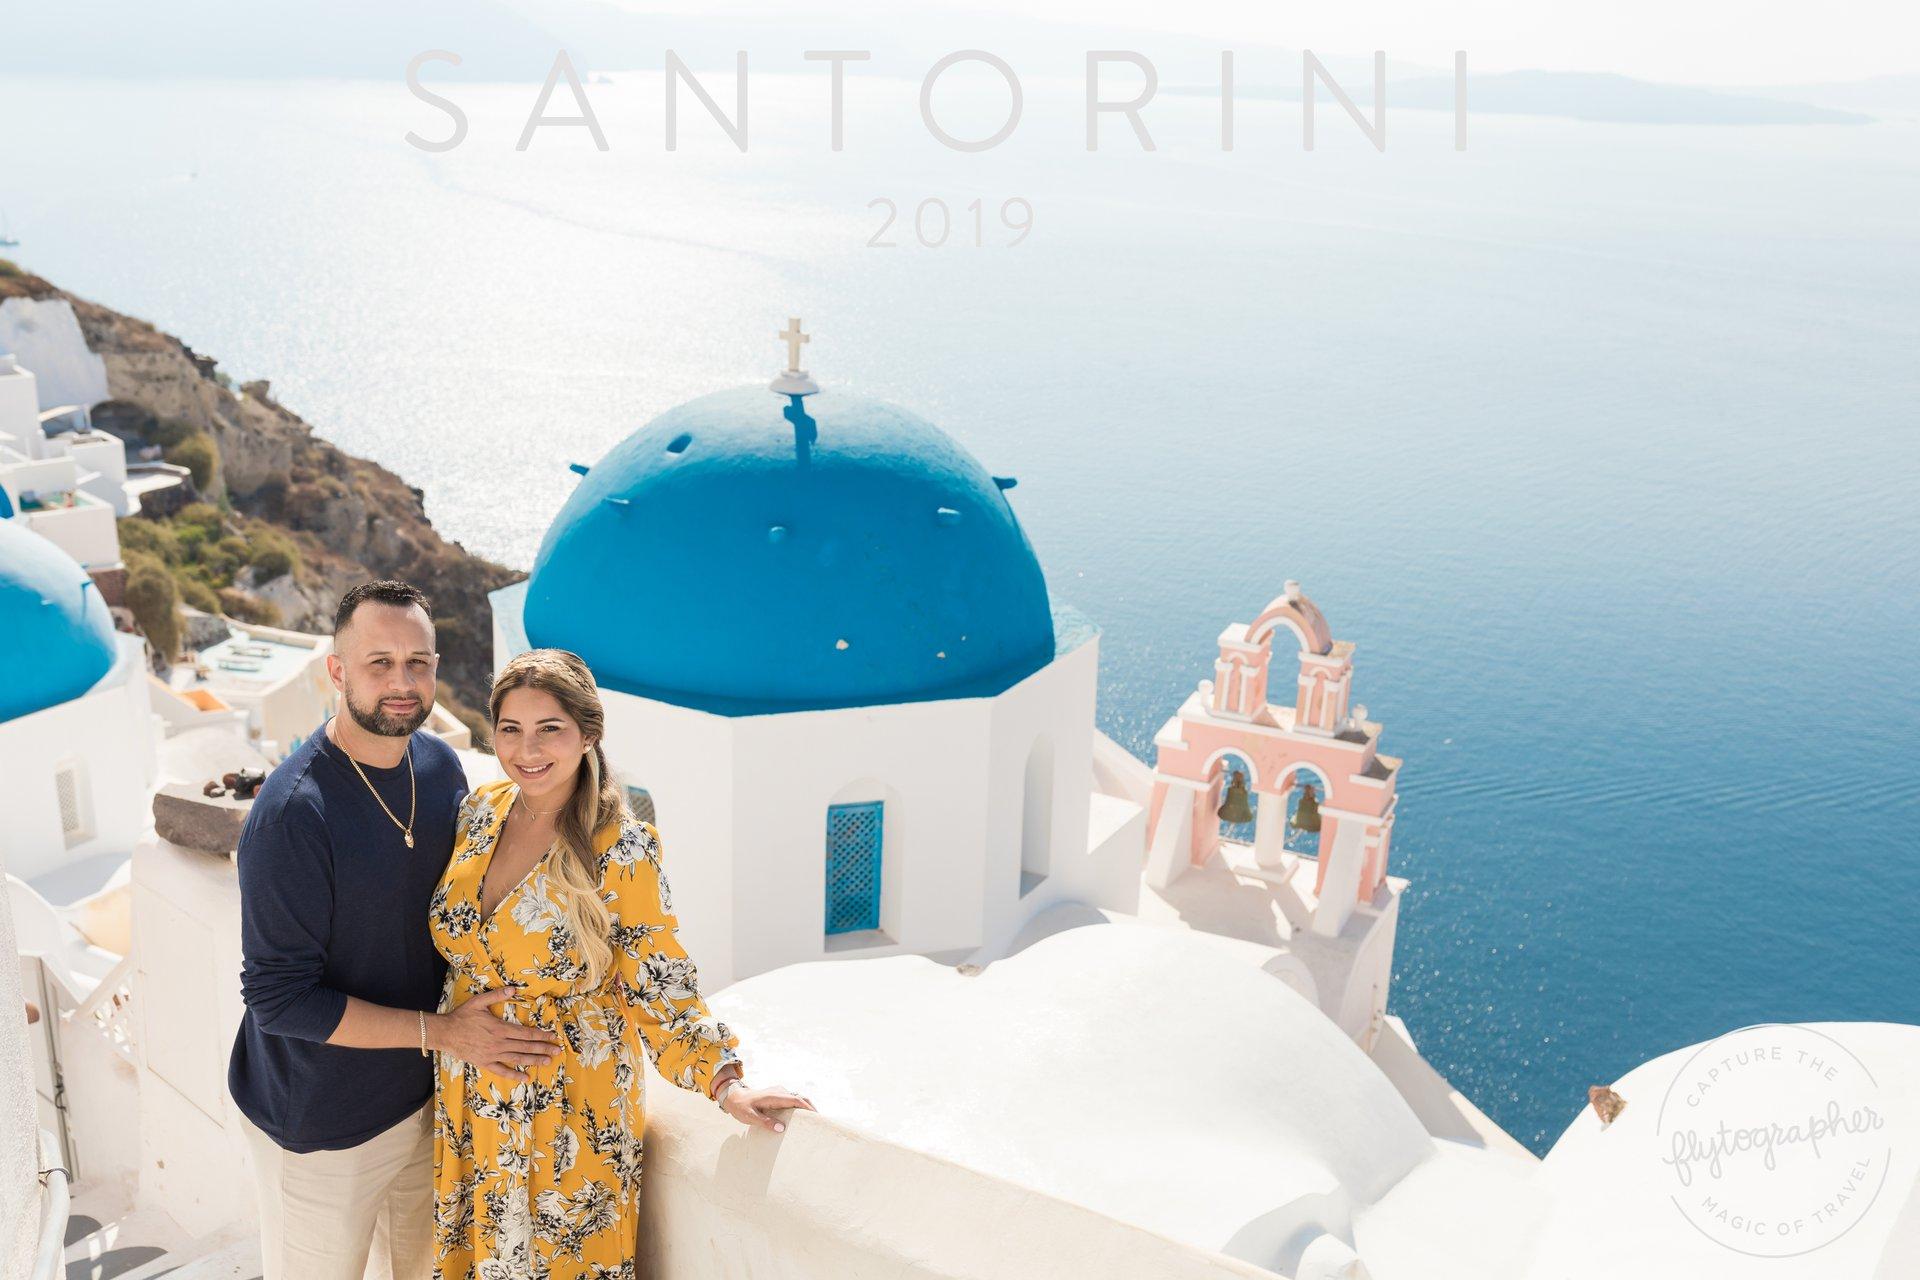 Santorini-Greece-travel-story-Flytographer-19